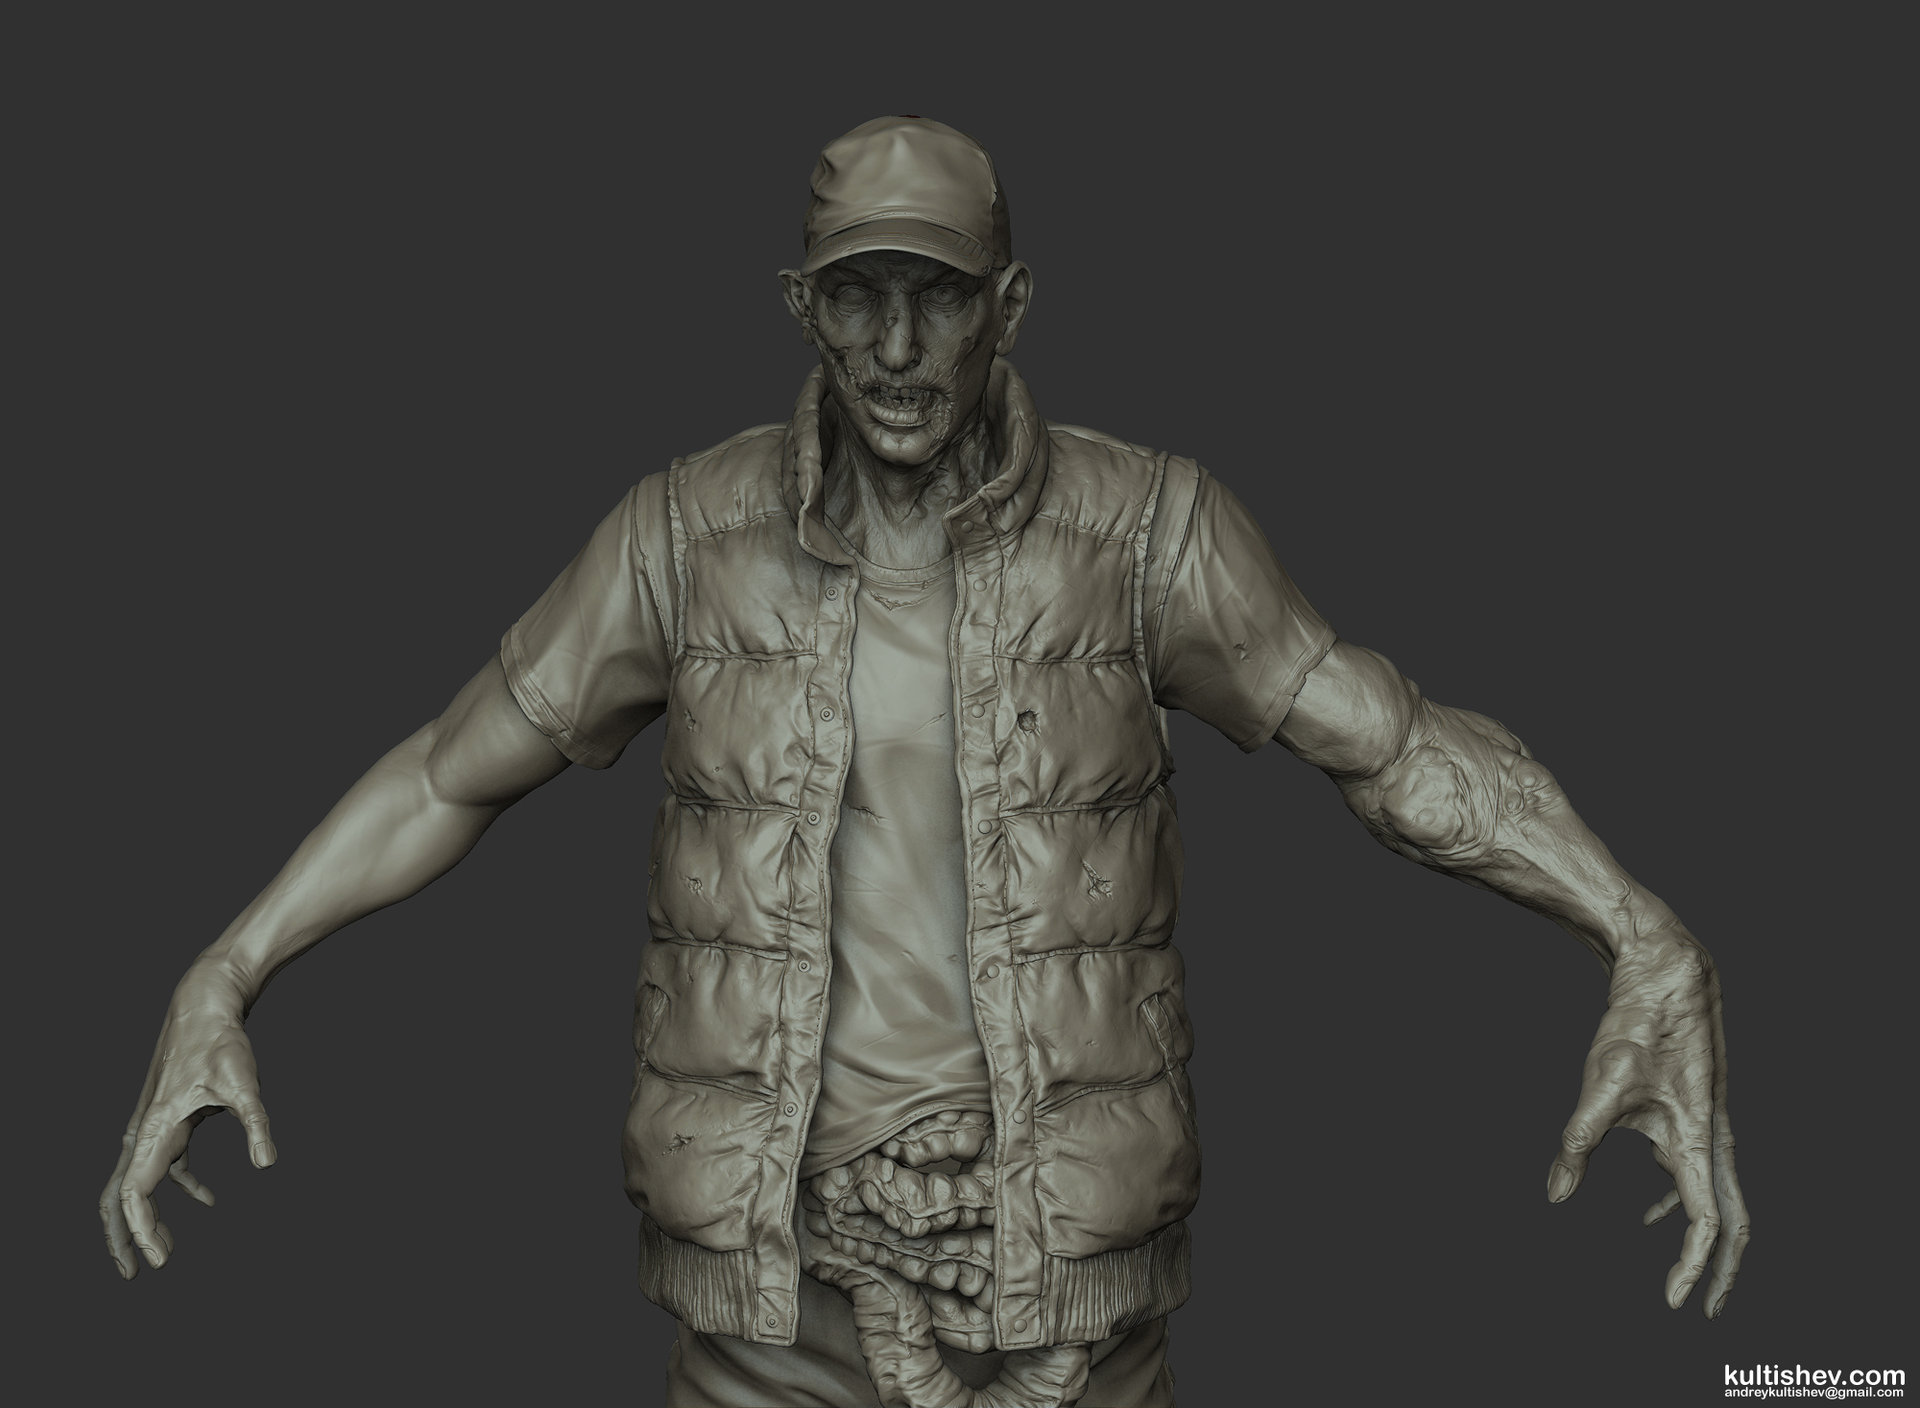 Andrey kultishev kultishev zombie sculpt01